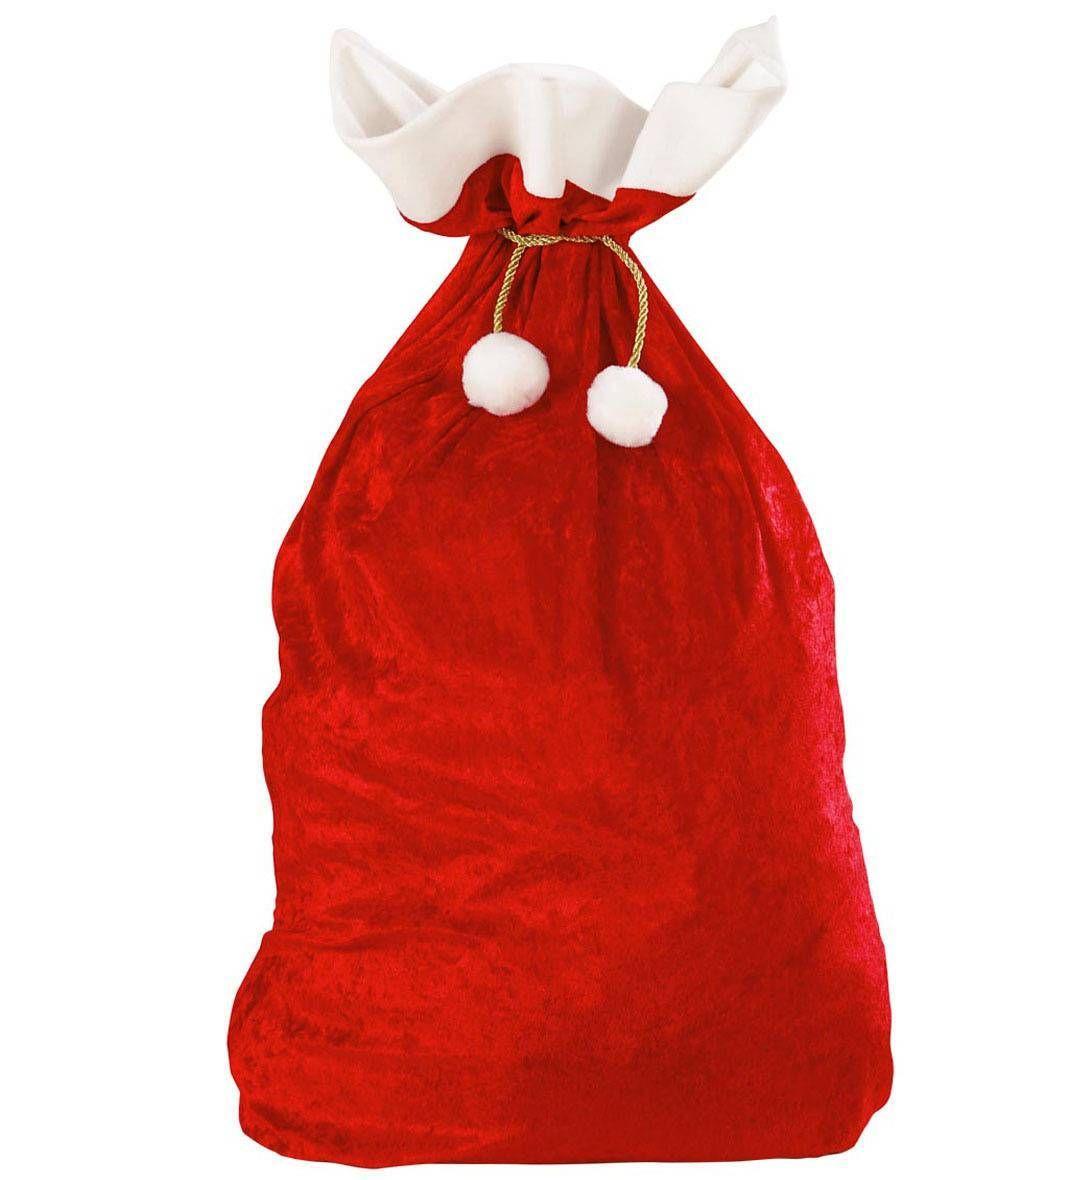 hotte noel Hotte rouge Père Noël | Xmas hotte noel